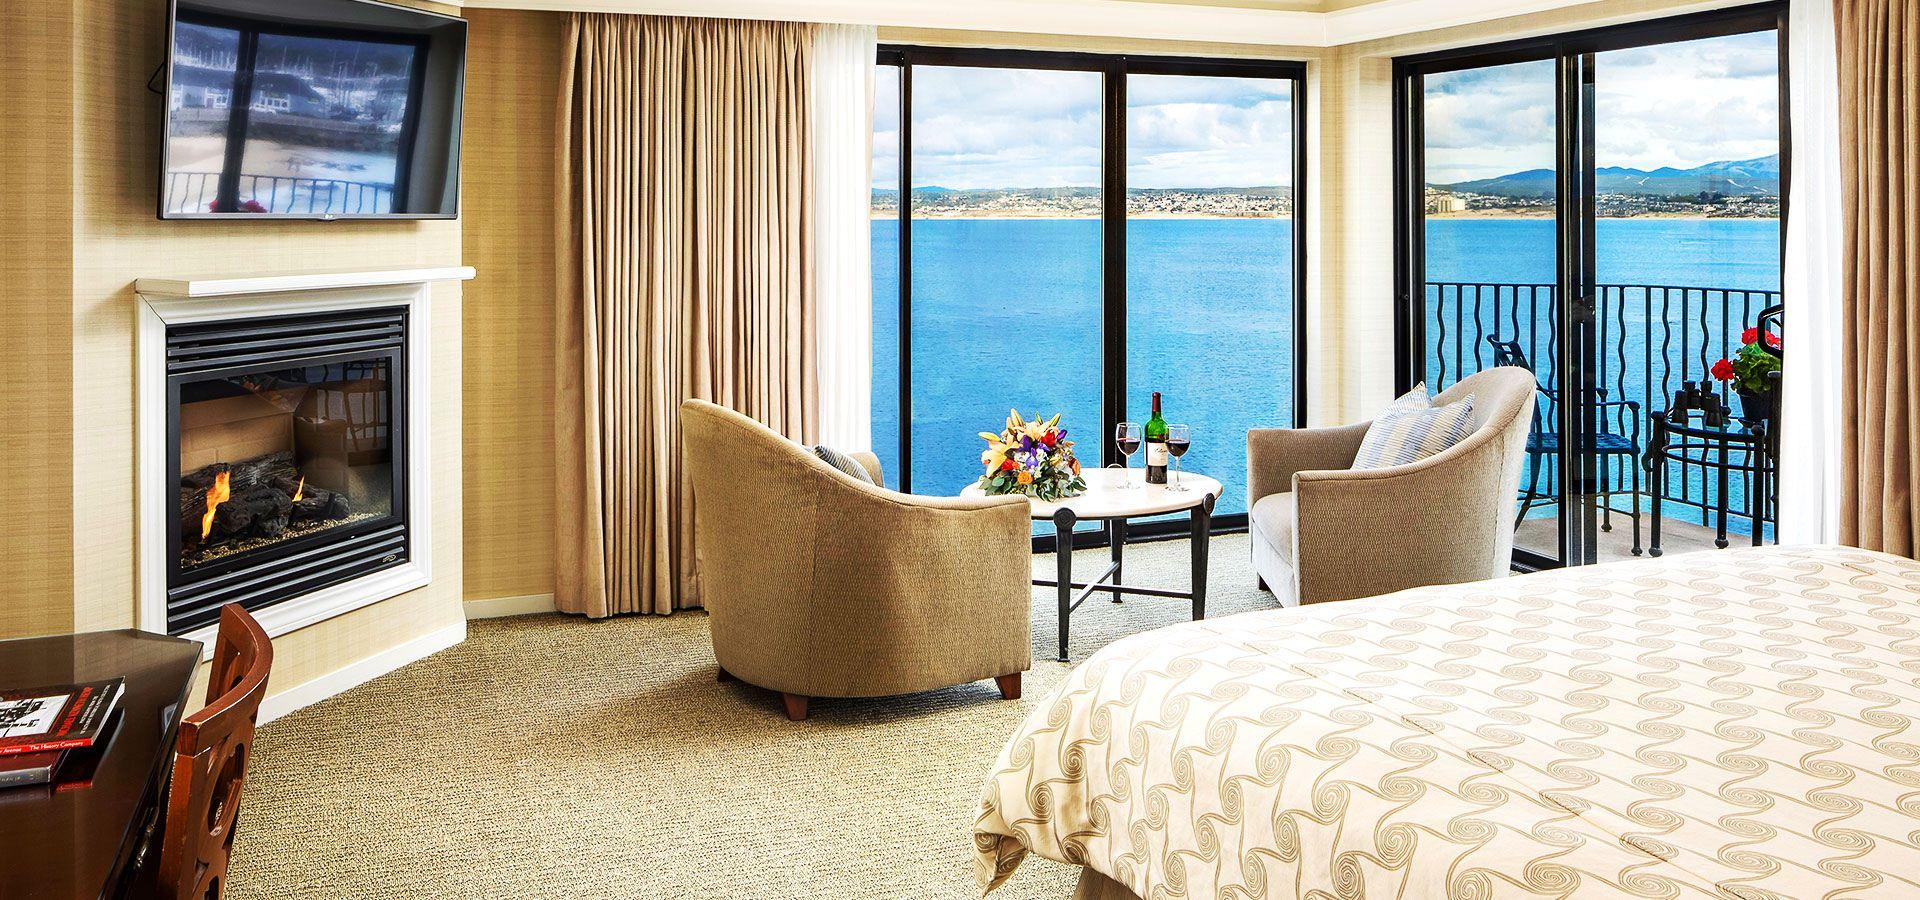 Stay in Monterey Bay Inn, California Hotel